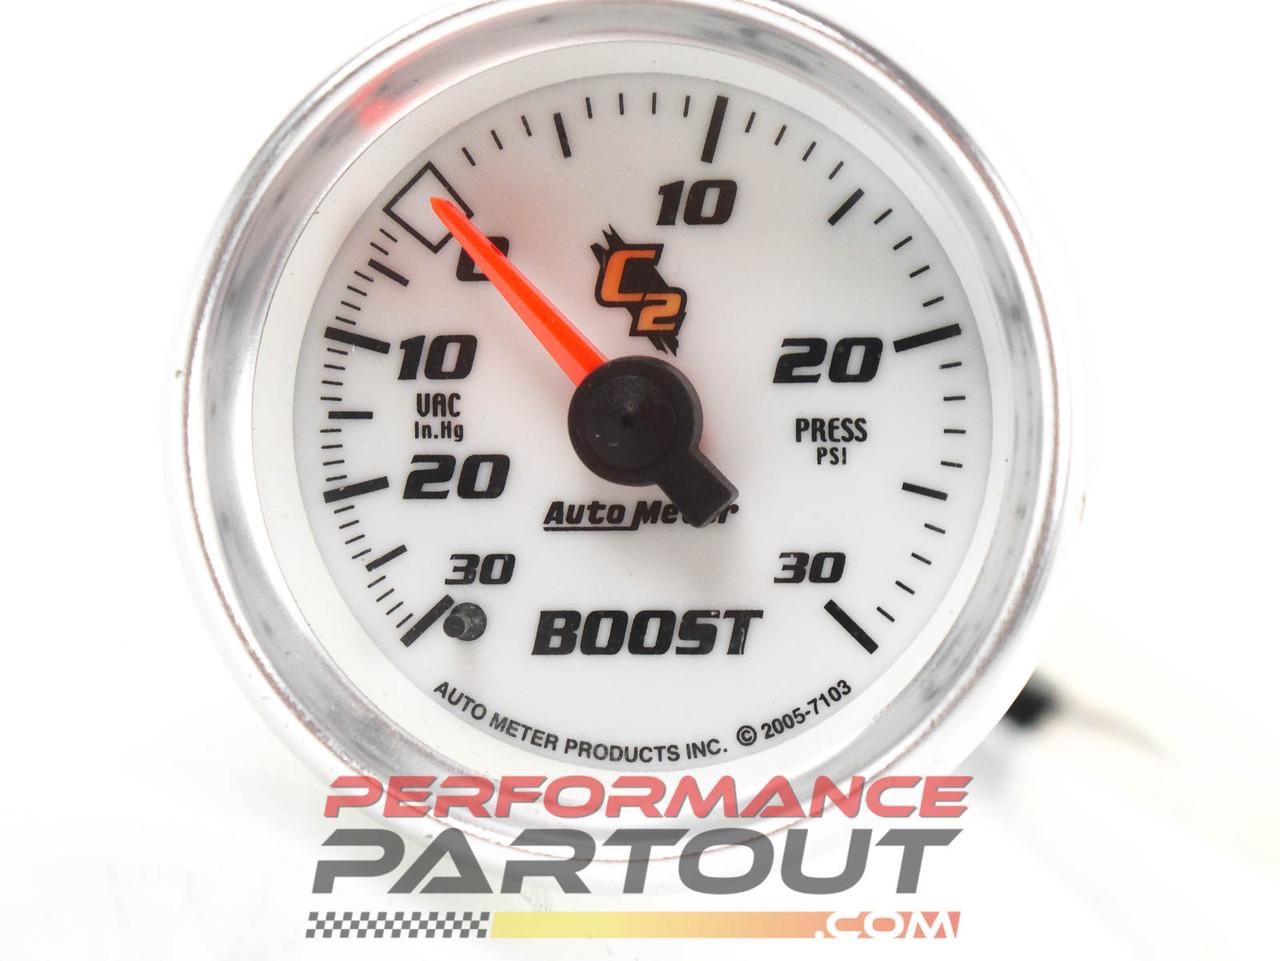 Autometer boost gauge C2 7103 Vac/30psi